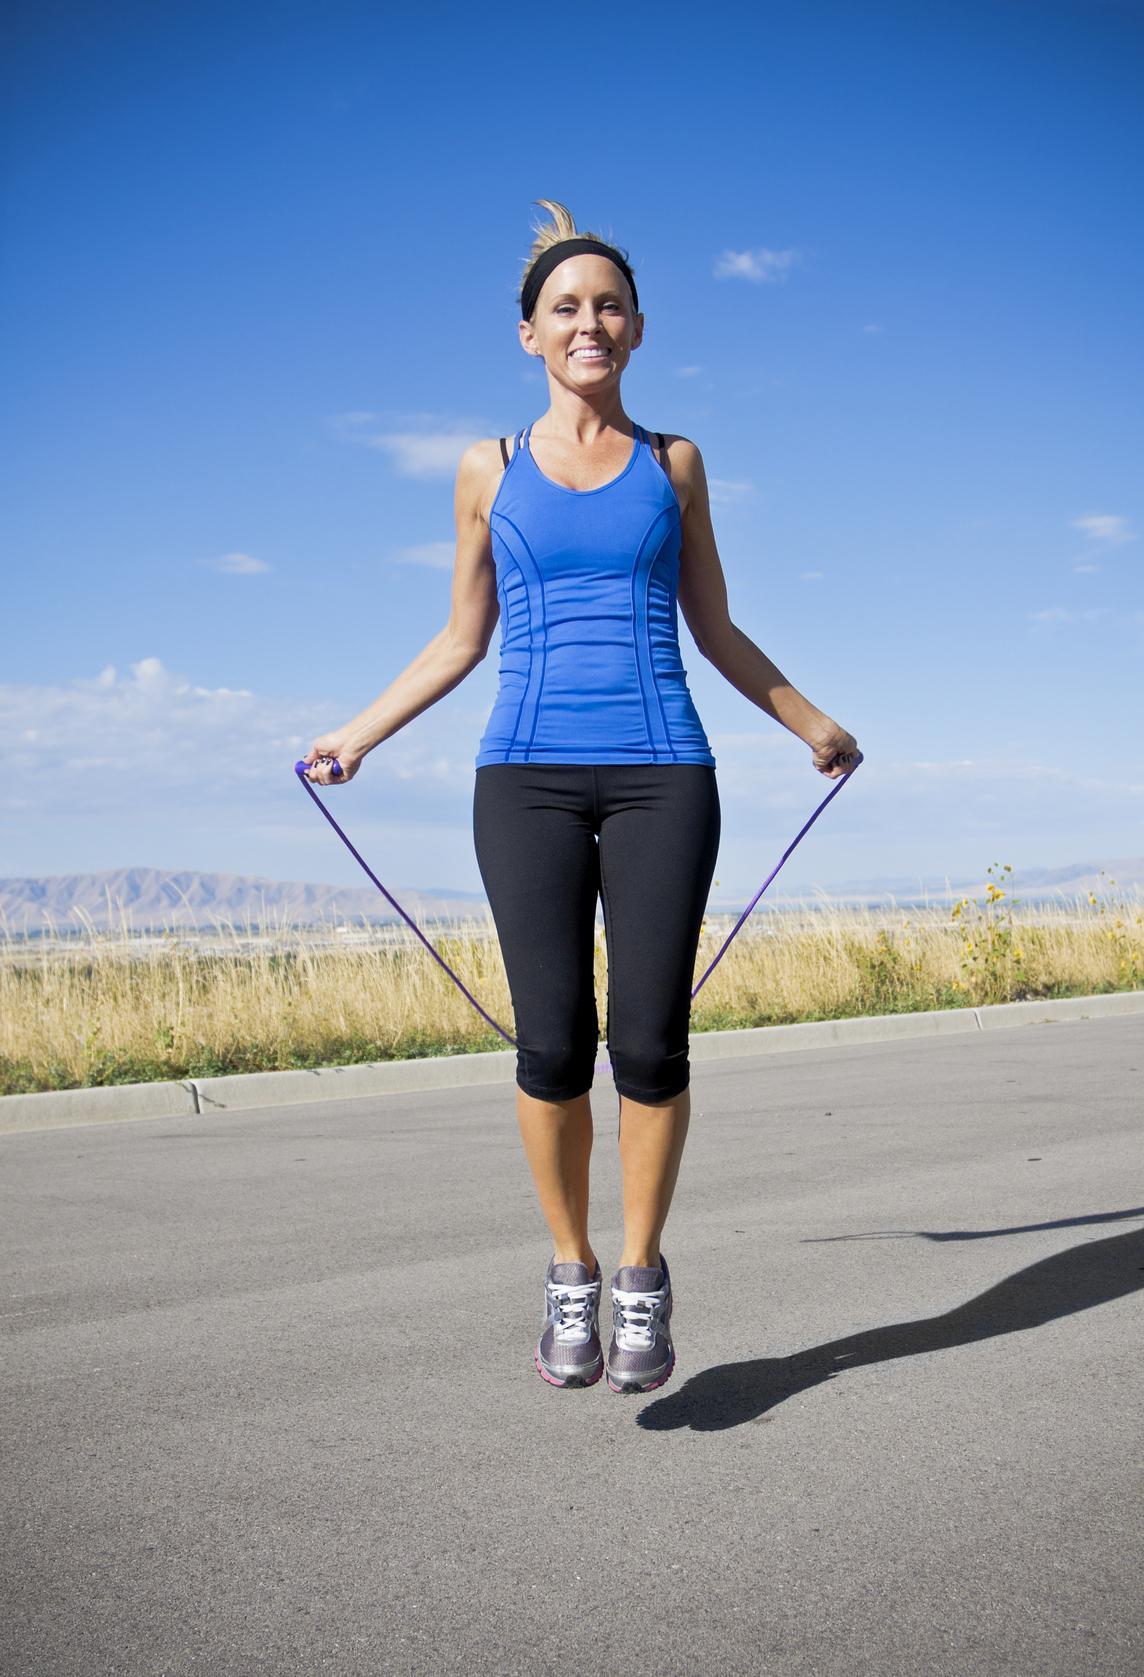 Mujer con camiseta azul salta a la comba